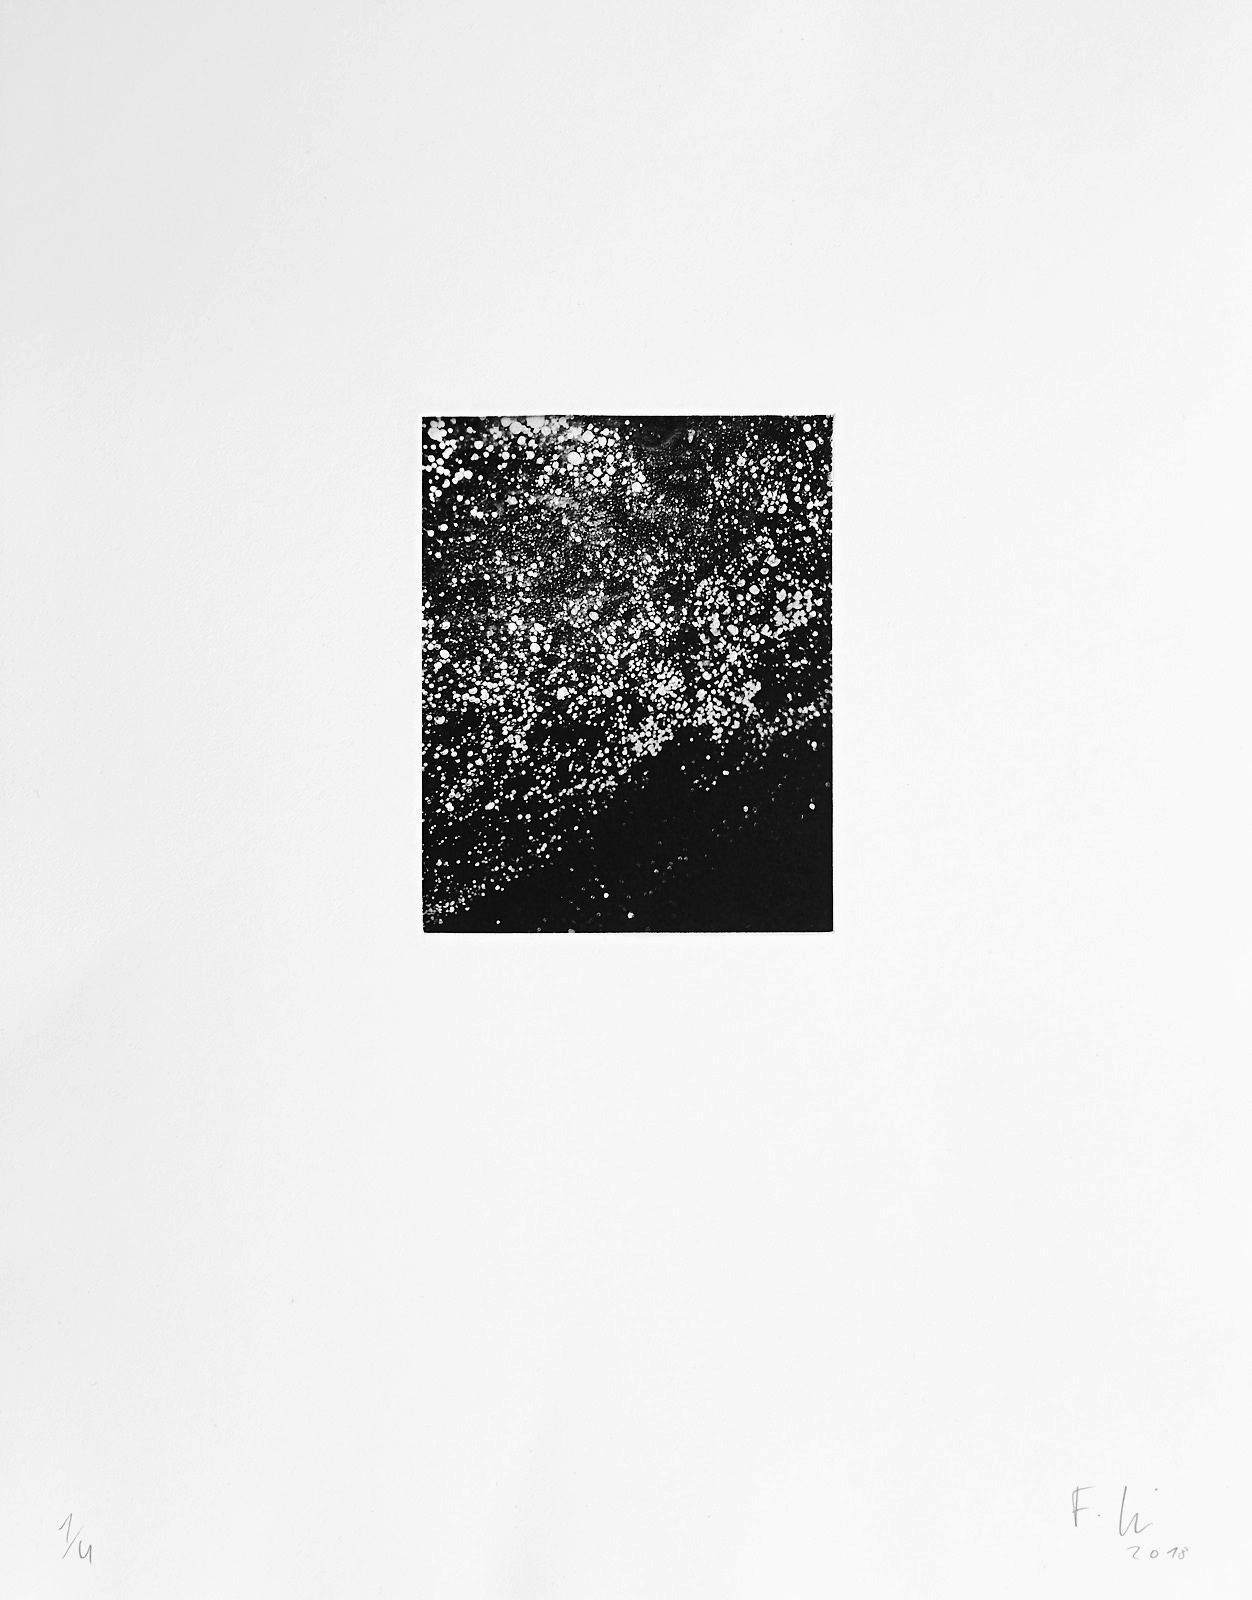 o.T.[Typologien#2]  (2018)  medium: Photogravure  size: 36 x 46 cm  paper: Zerkall 270 g/qm  plate: 11.7 x 14.7 cm  edition: 6 copies  numbered: 1/4 - 4/4, 2 e.a.  printer: FWU